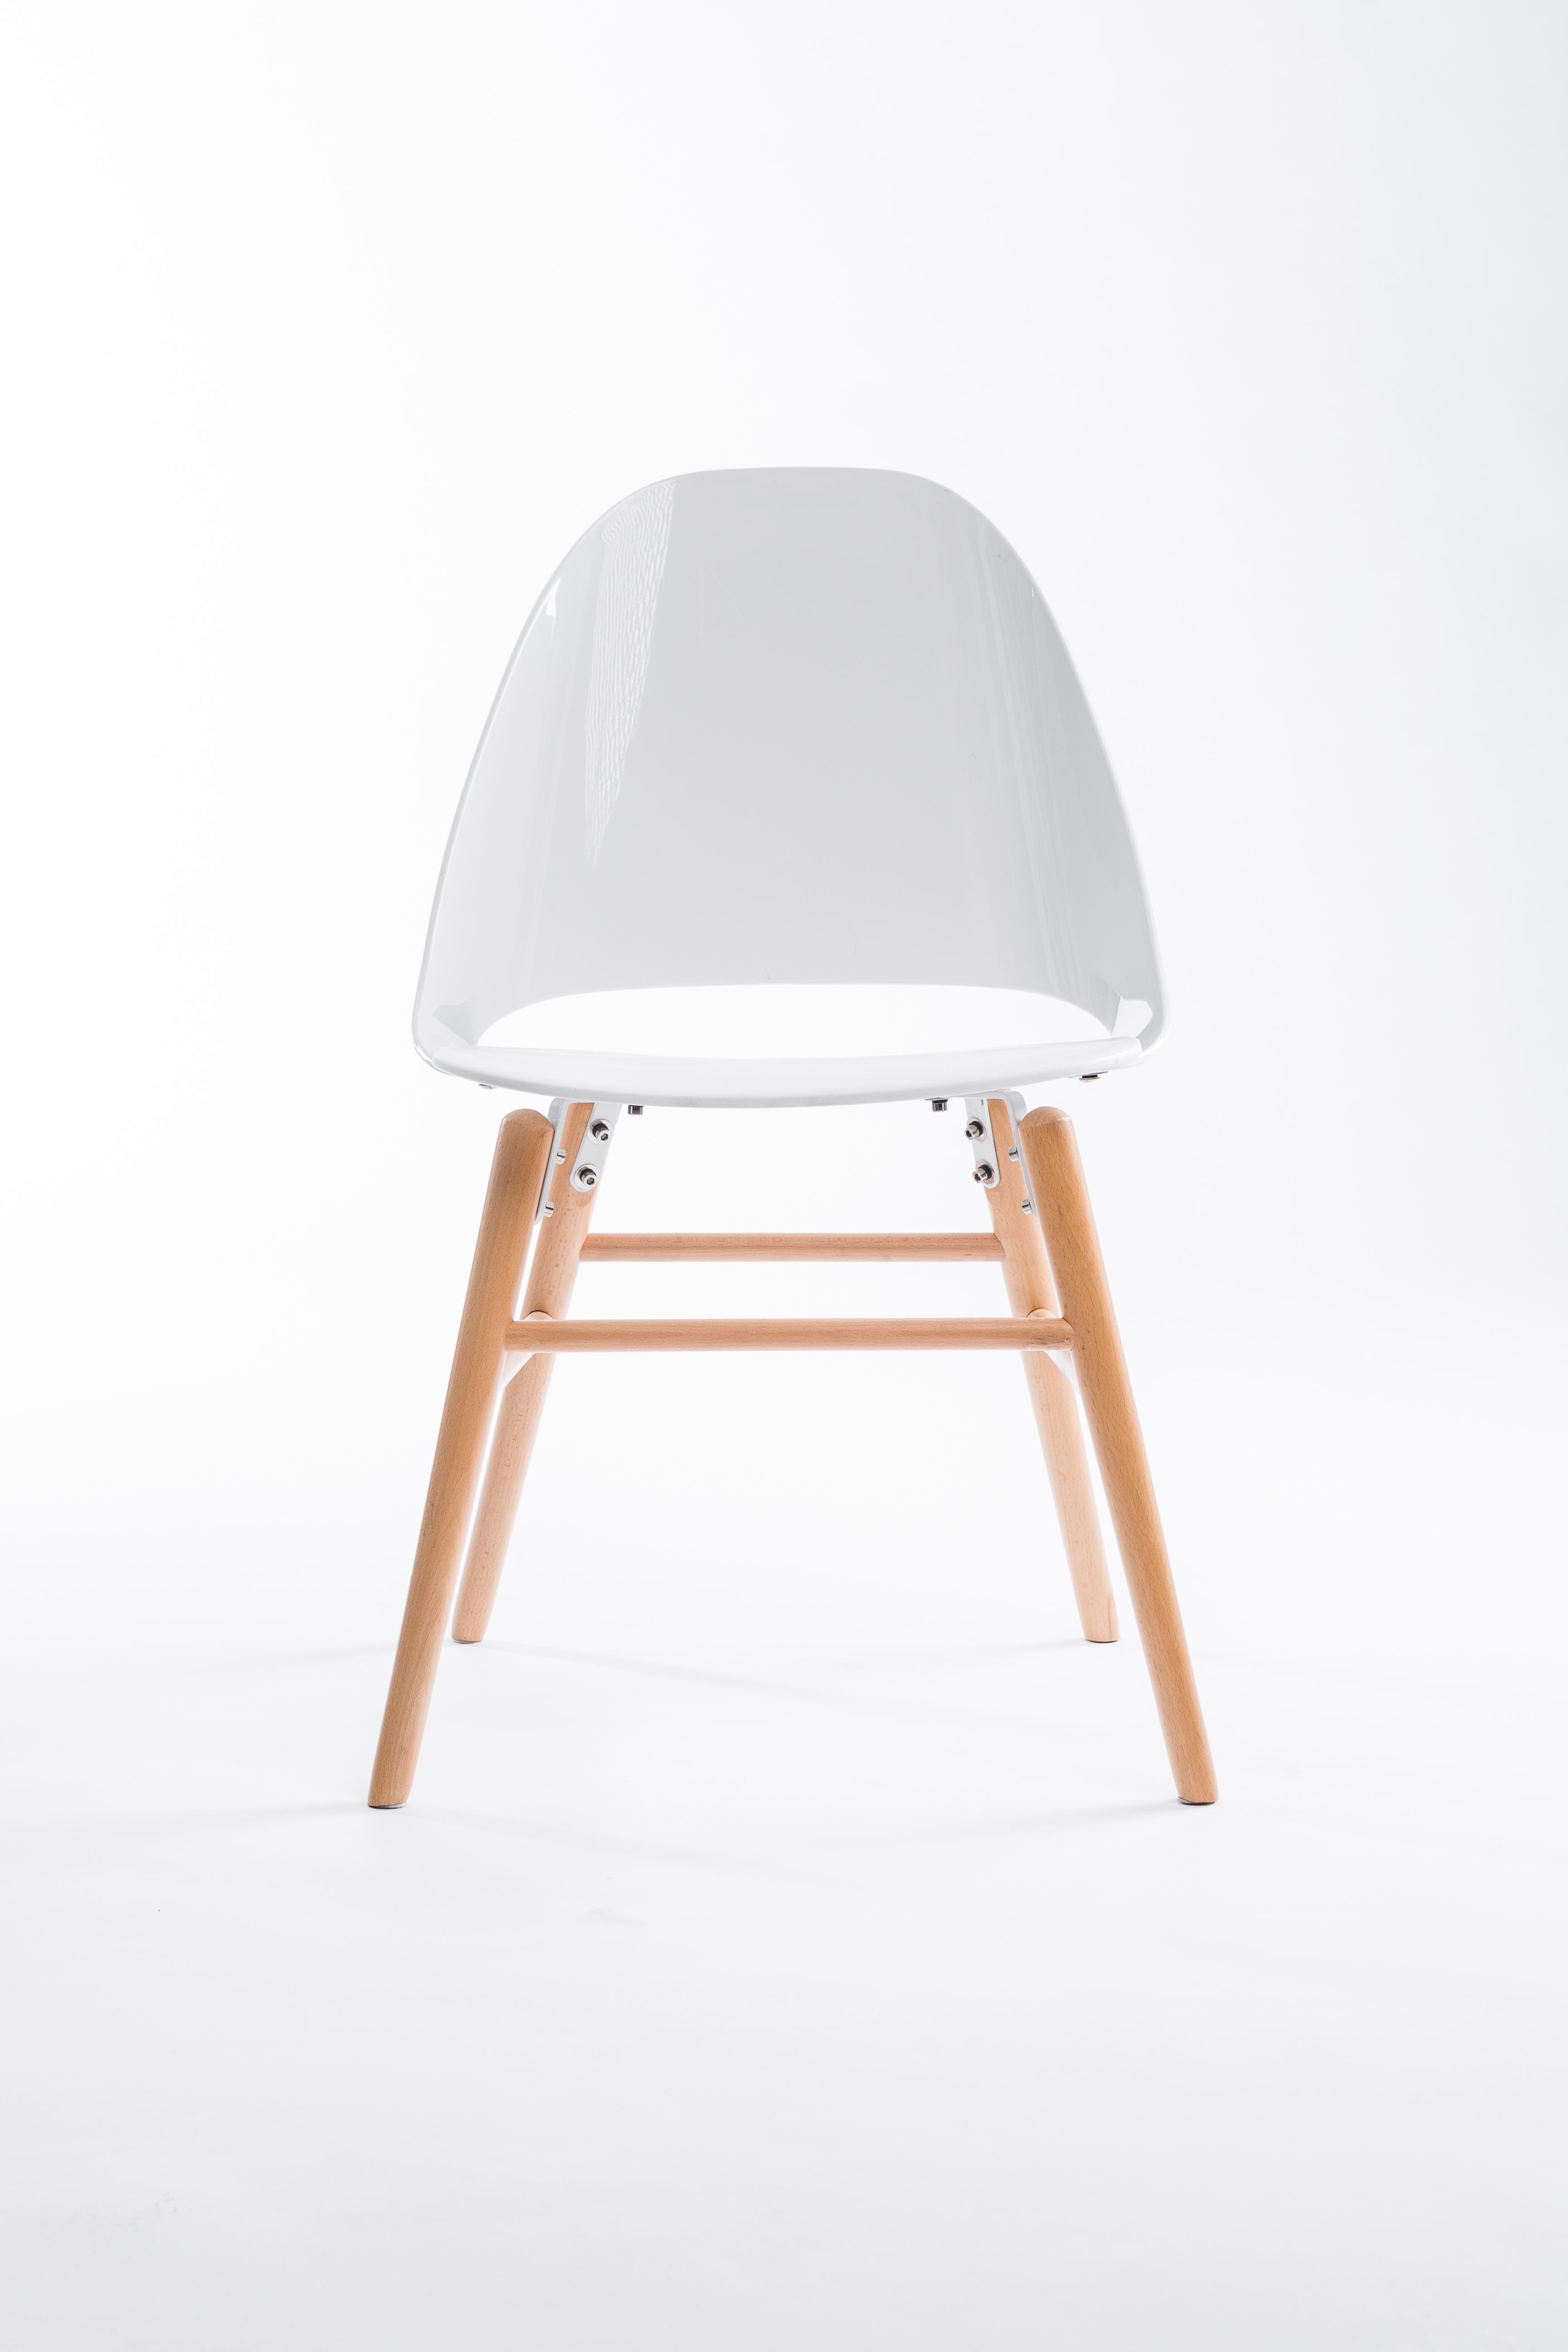 Sedia Copenhagen Bianca By Unico Milano - Restylit Shop